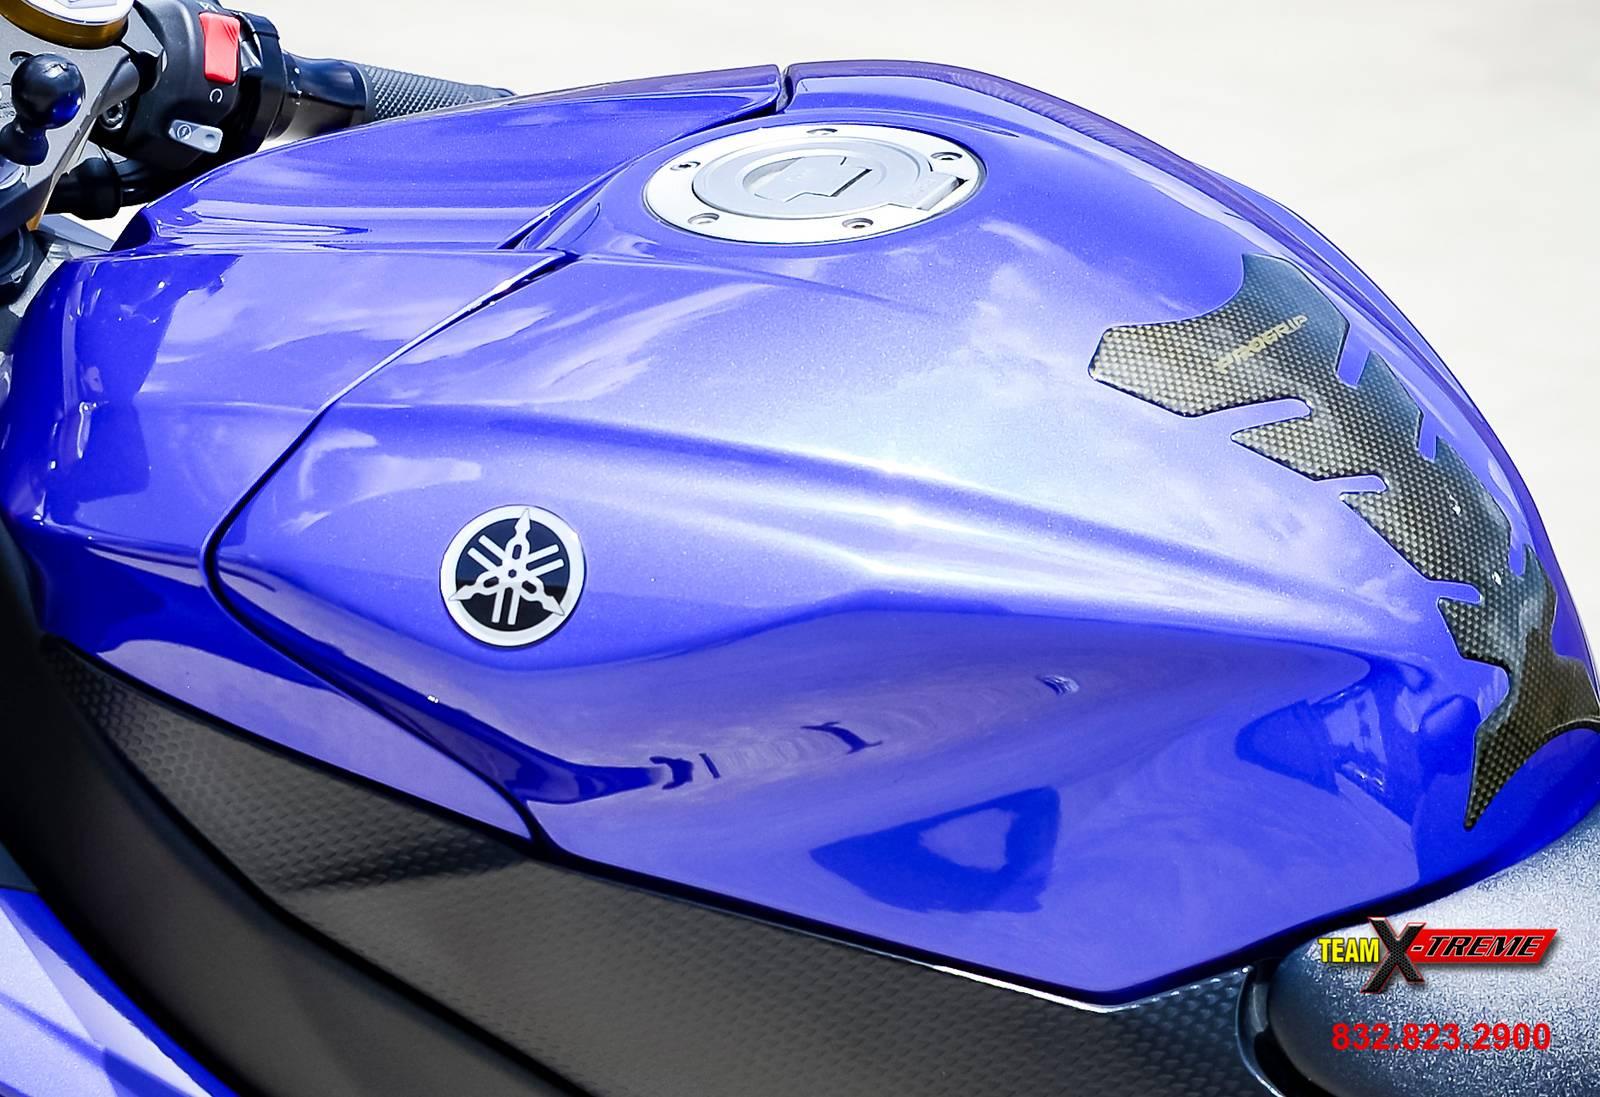 2013 Yamaha YZF-R6 11